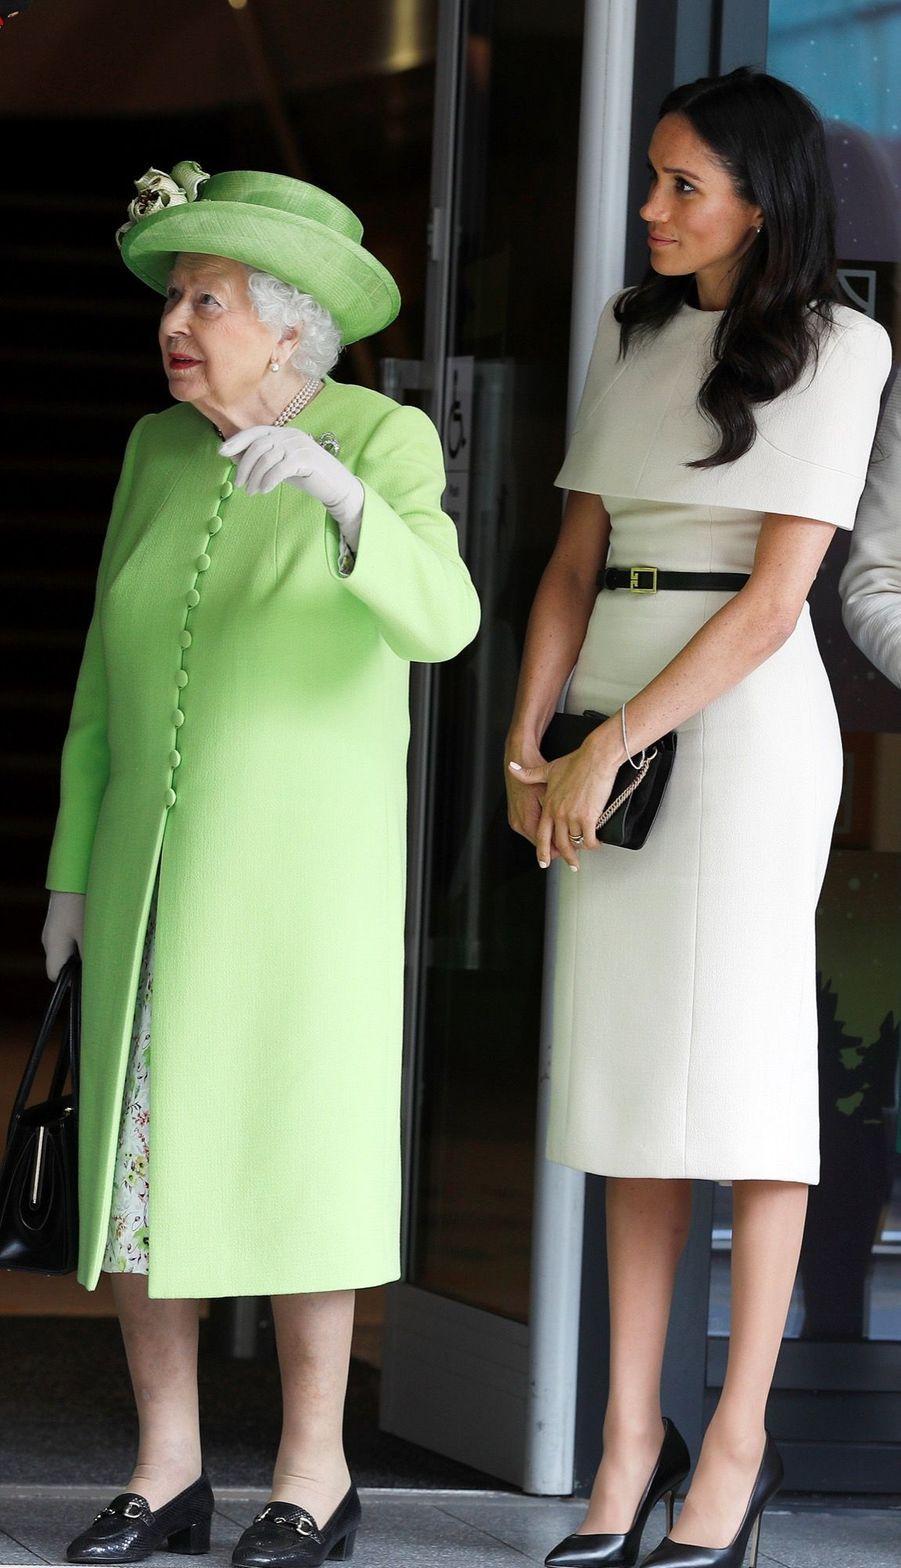 Meghan Markle Et La Reine Elizabeth II En Viste Dans Le Nord De L'Angleterre ( 21